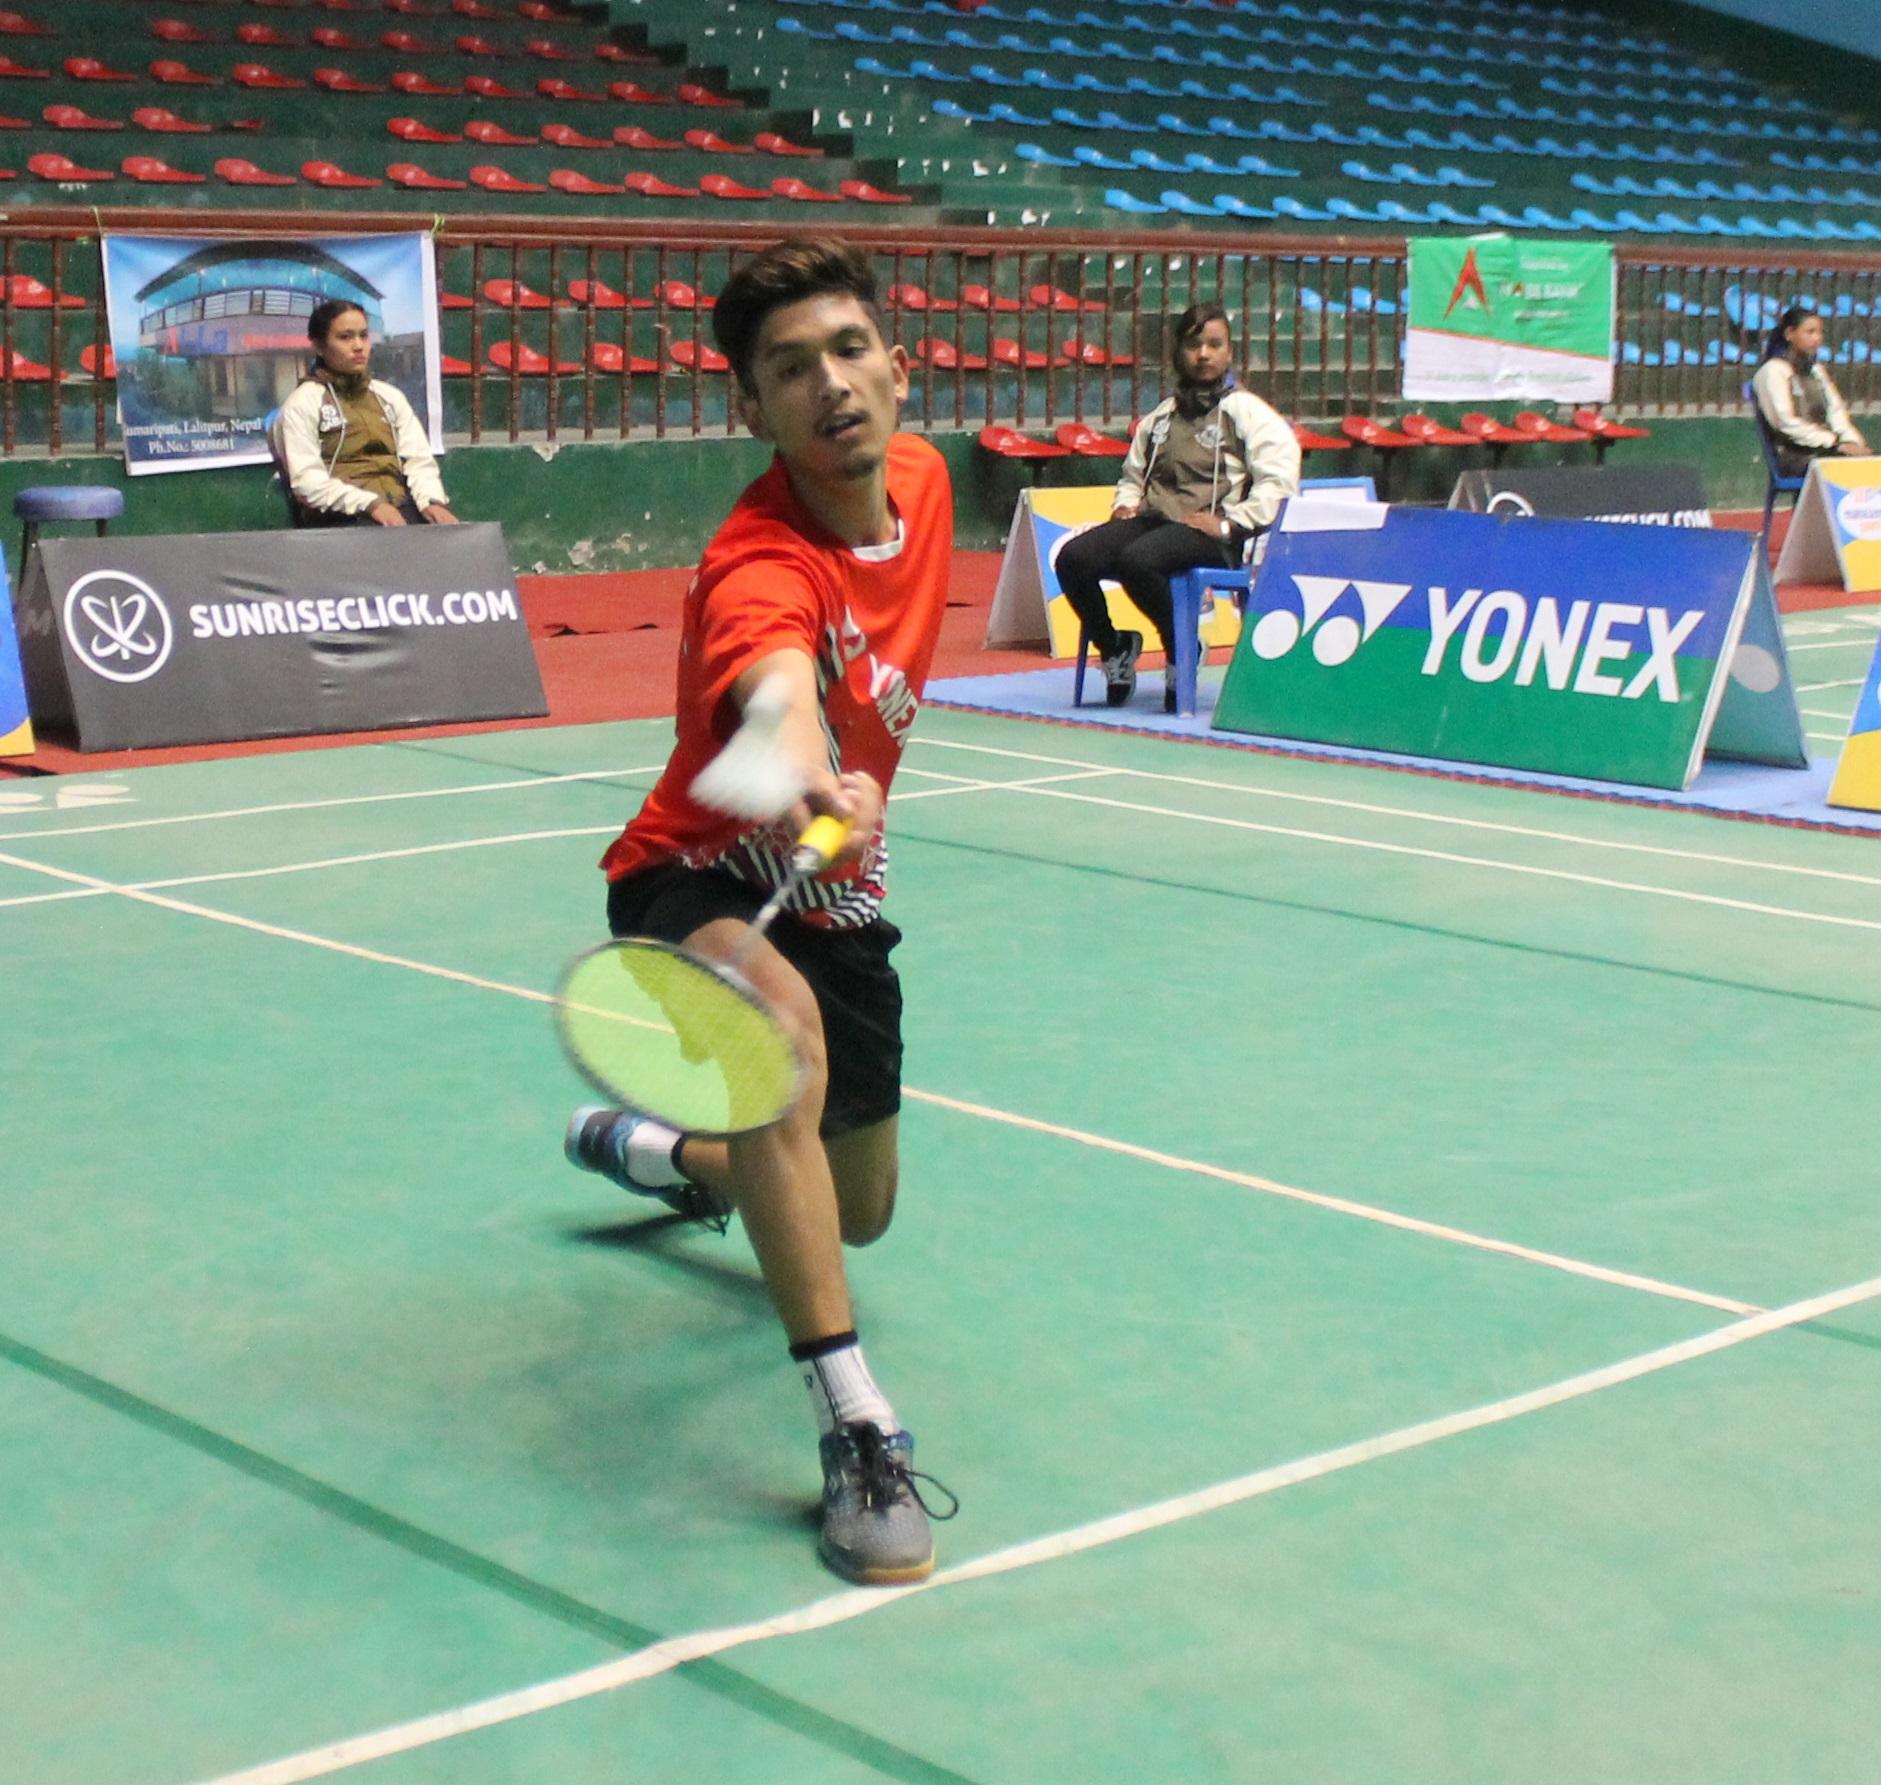 Rukesh Maharjan of TAC returns to Bishnu Katuwal of NPC during their menu2019s singles quarter-final match of the Yonex Sunrise eighth Pushpalal Memorial National Open Badminton Tournament in Kathmandu on Thursday, November 15, 2018. Photo: THT